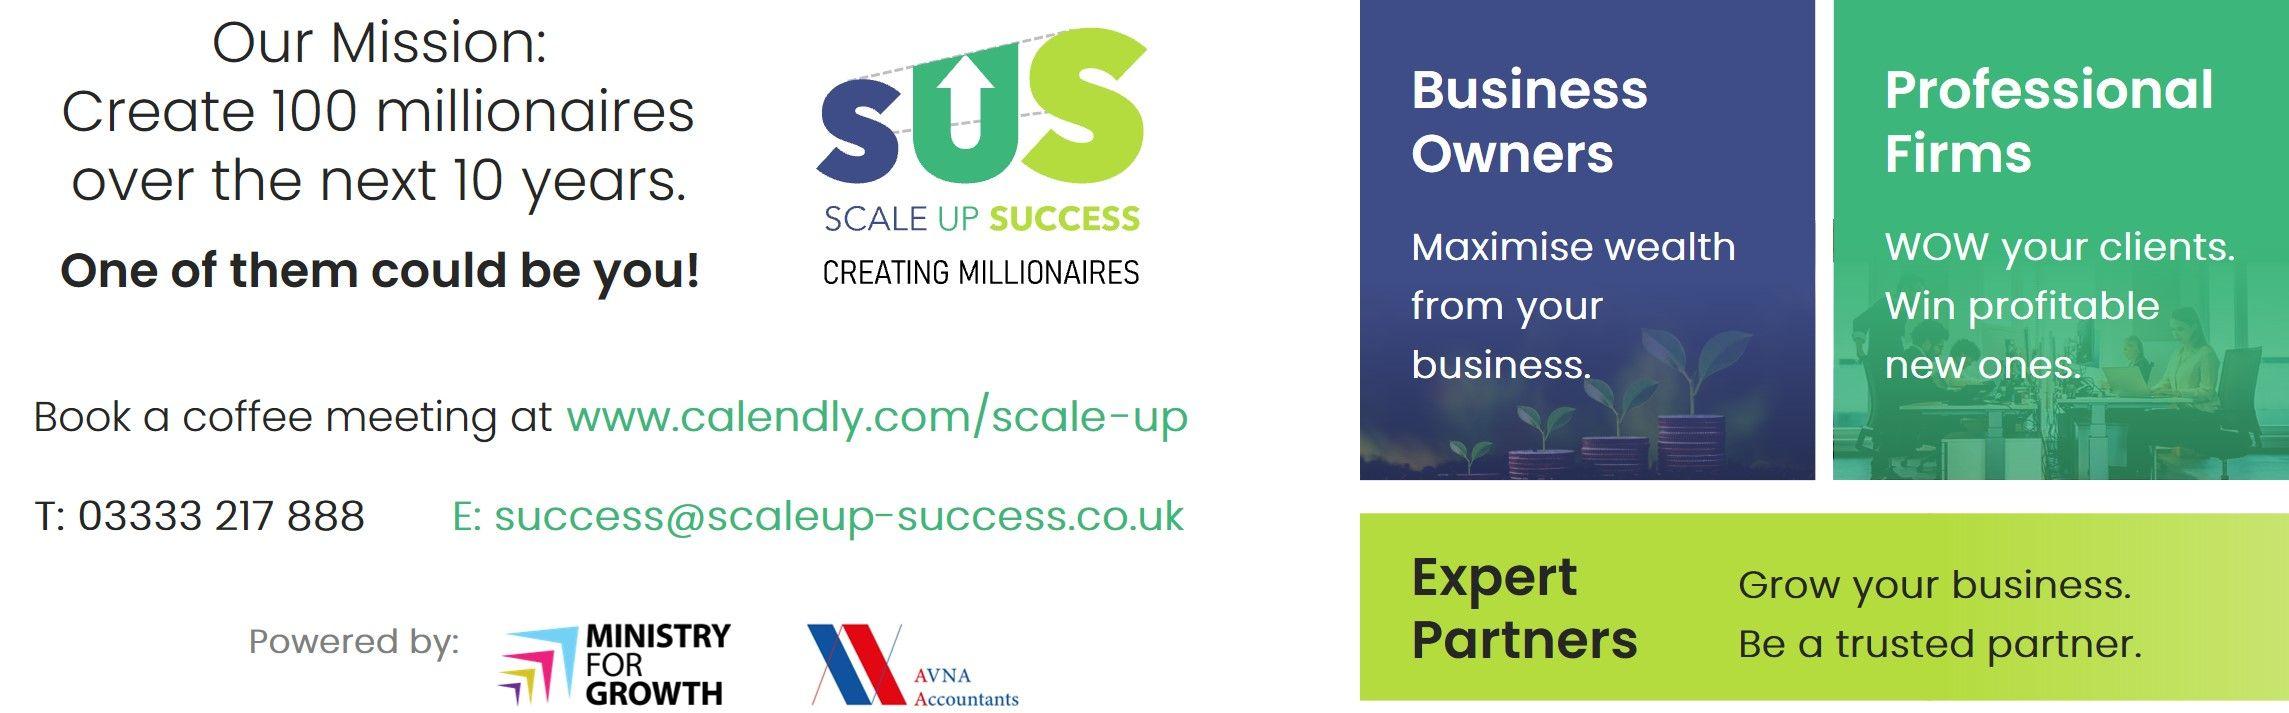 Scale Up Success